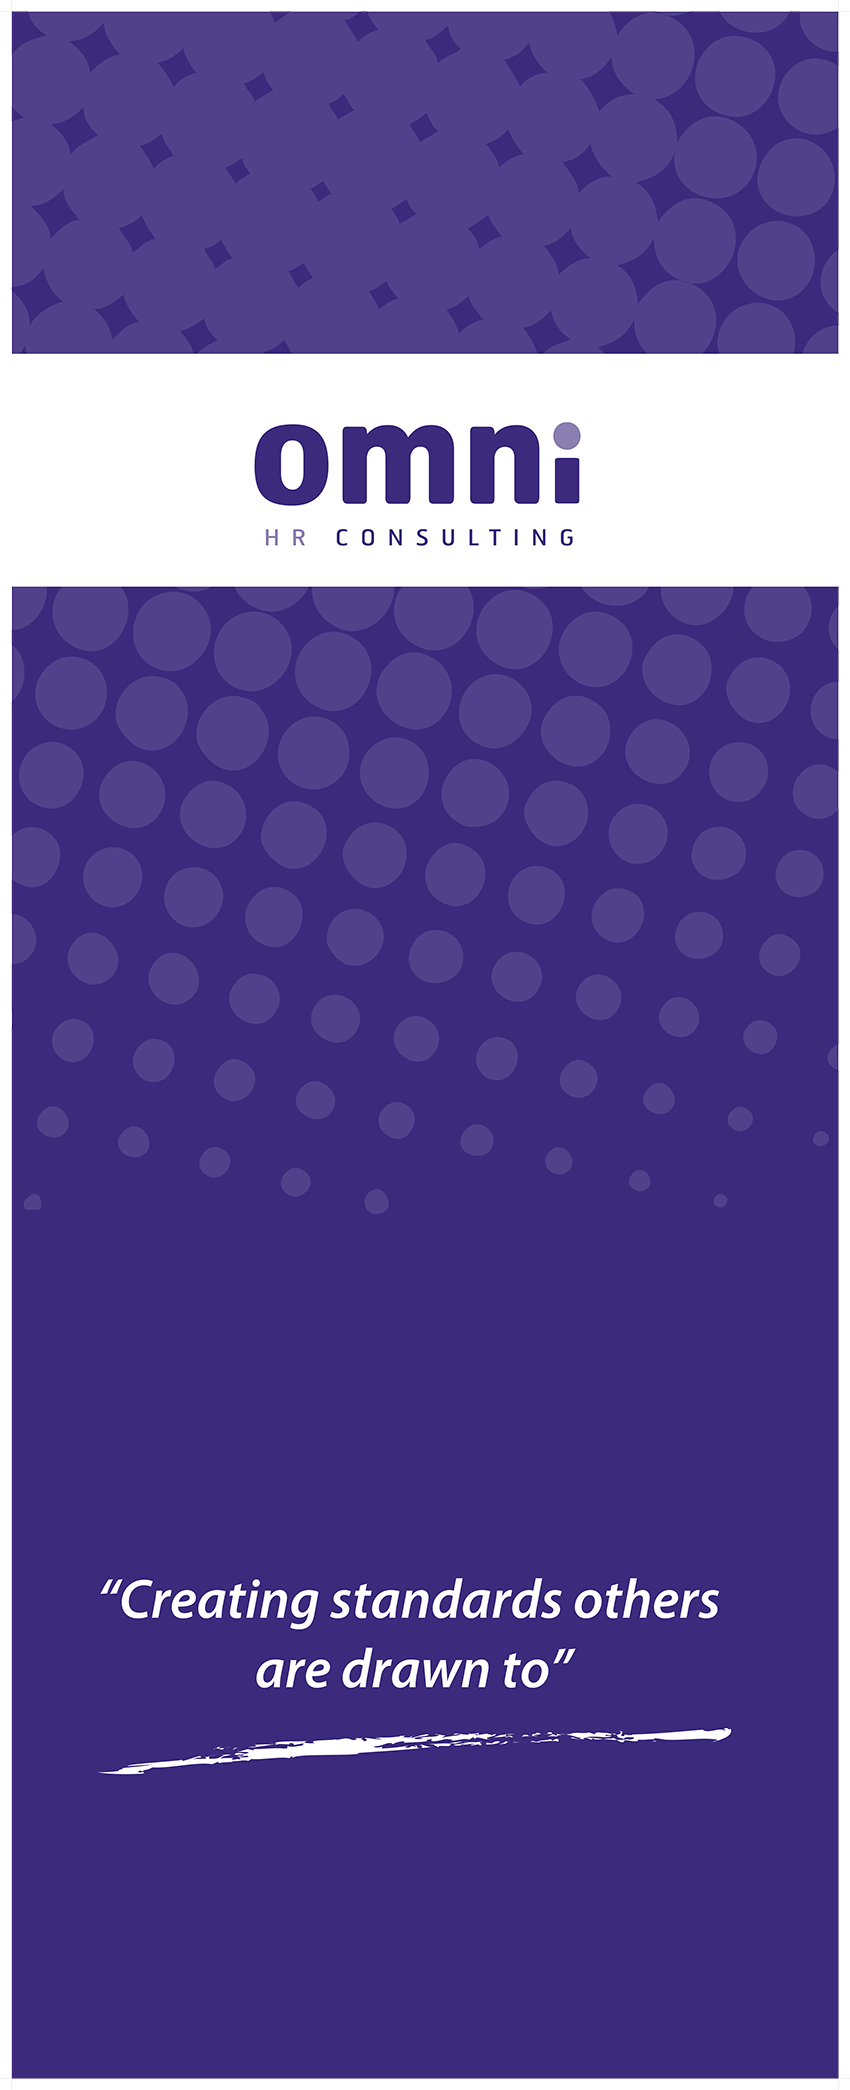 OMNI plain p u banner final - OMNI